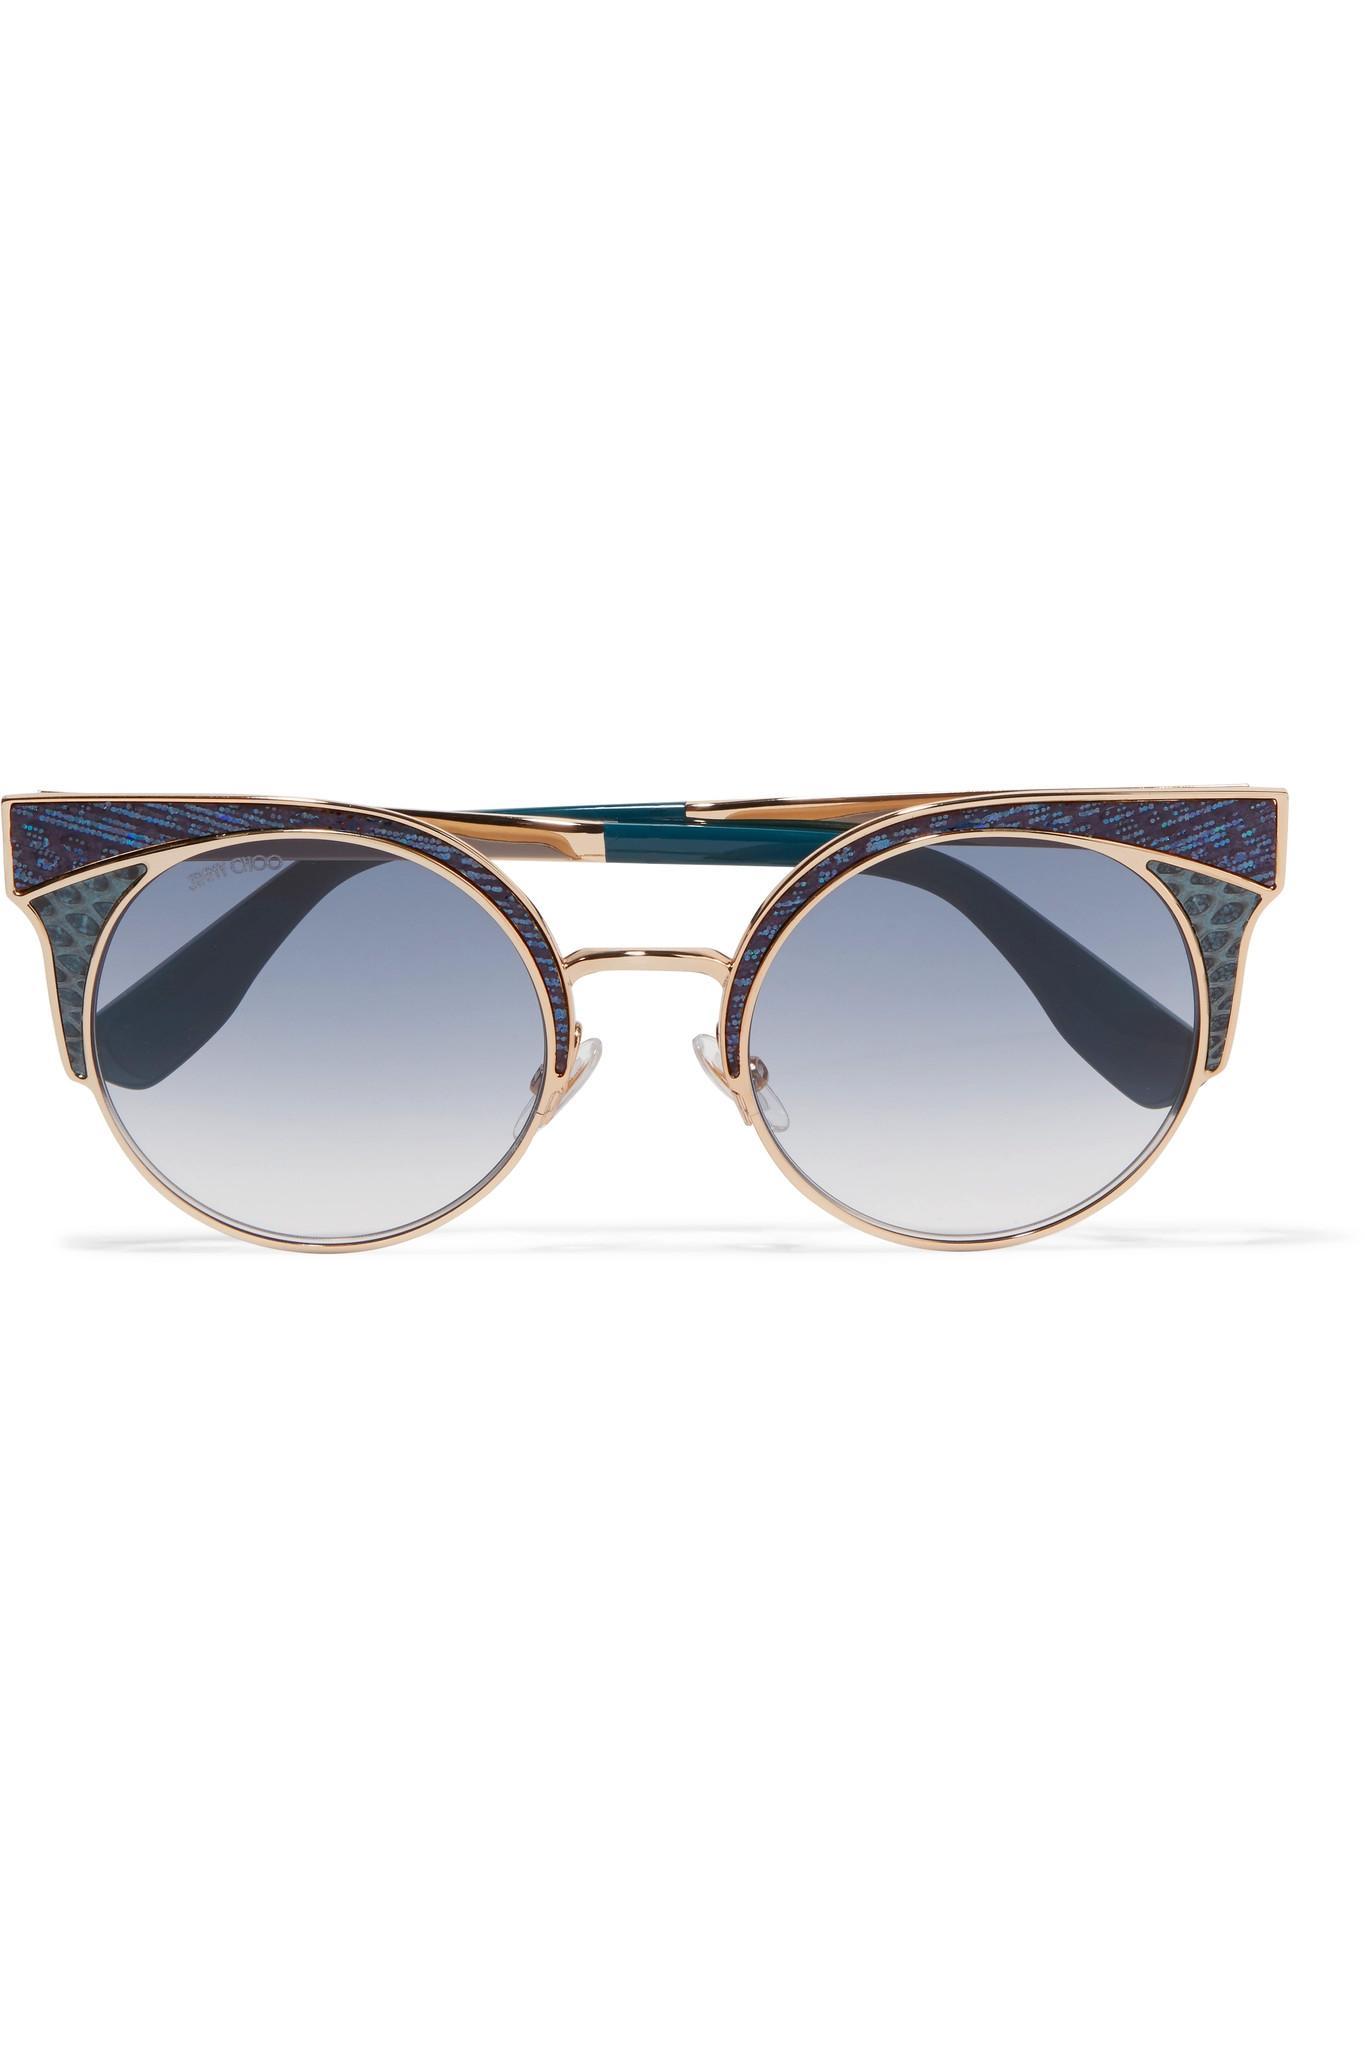 Jimmy Choo Sunglasses Cat Eye